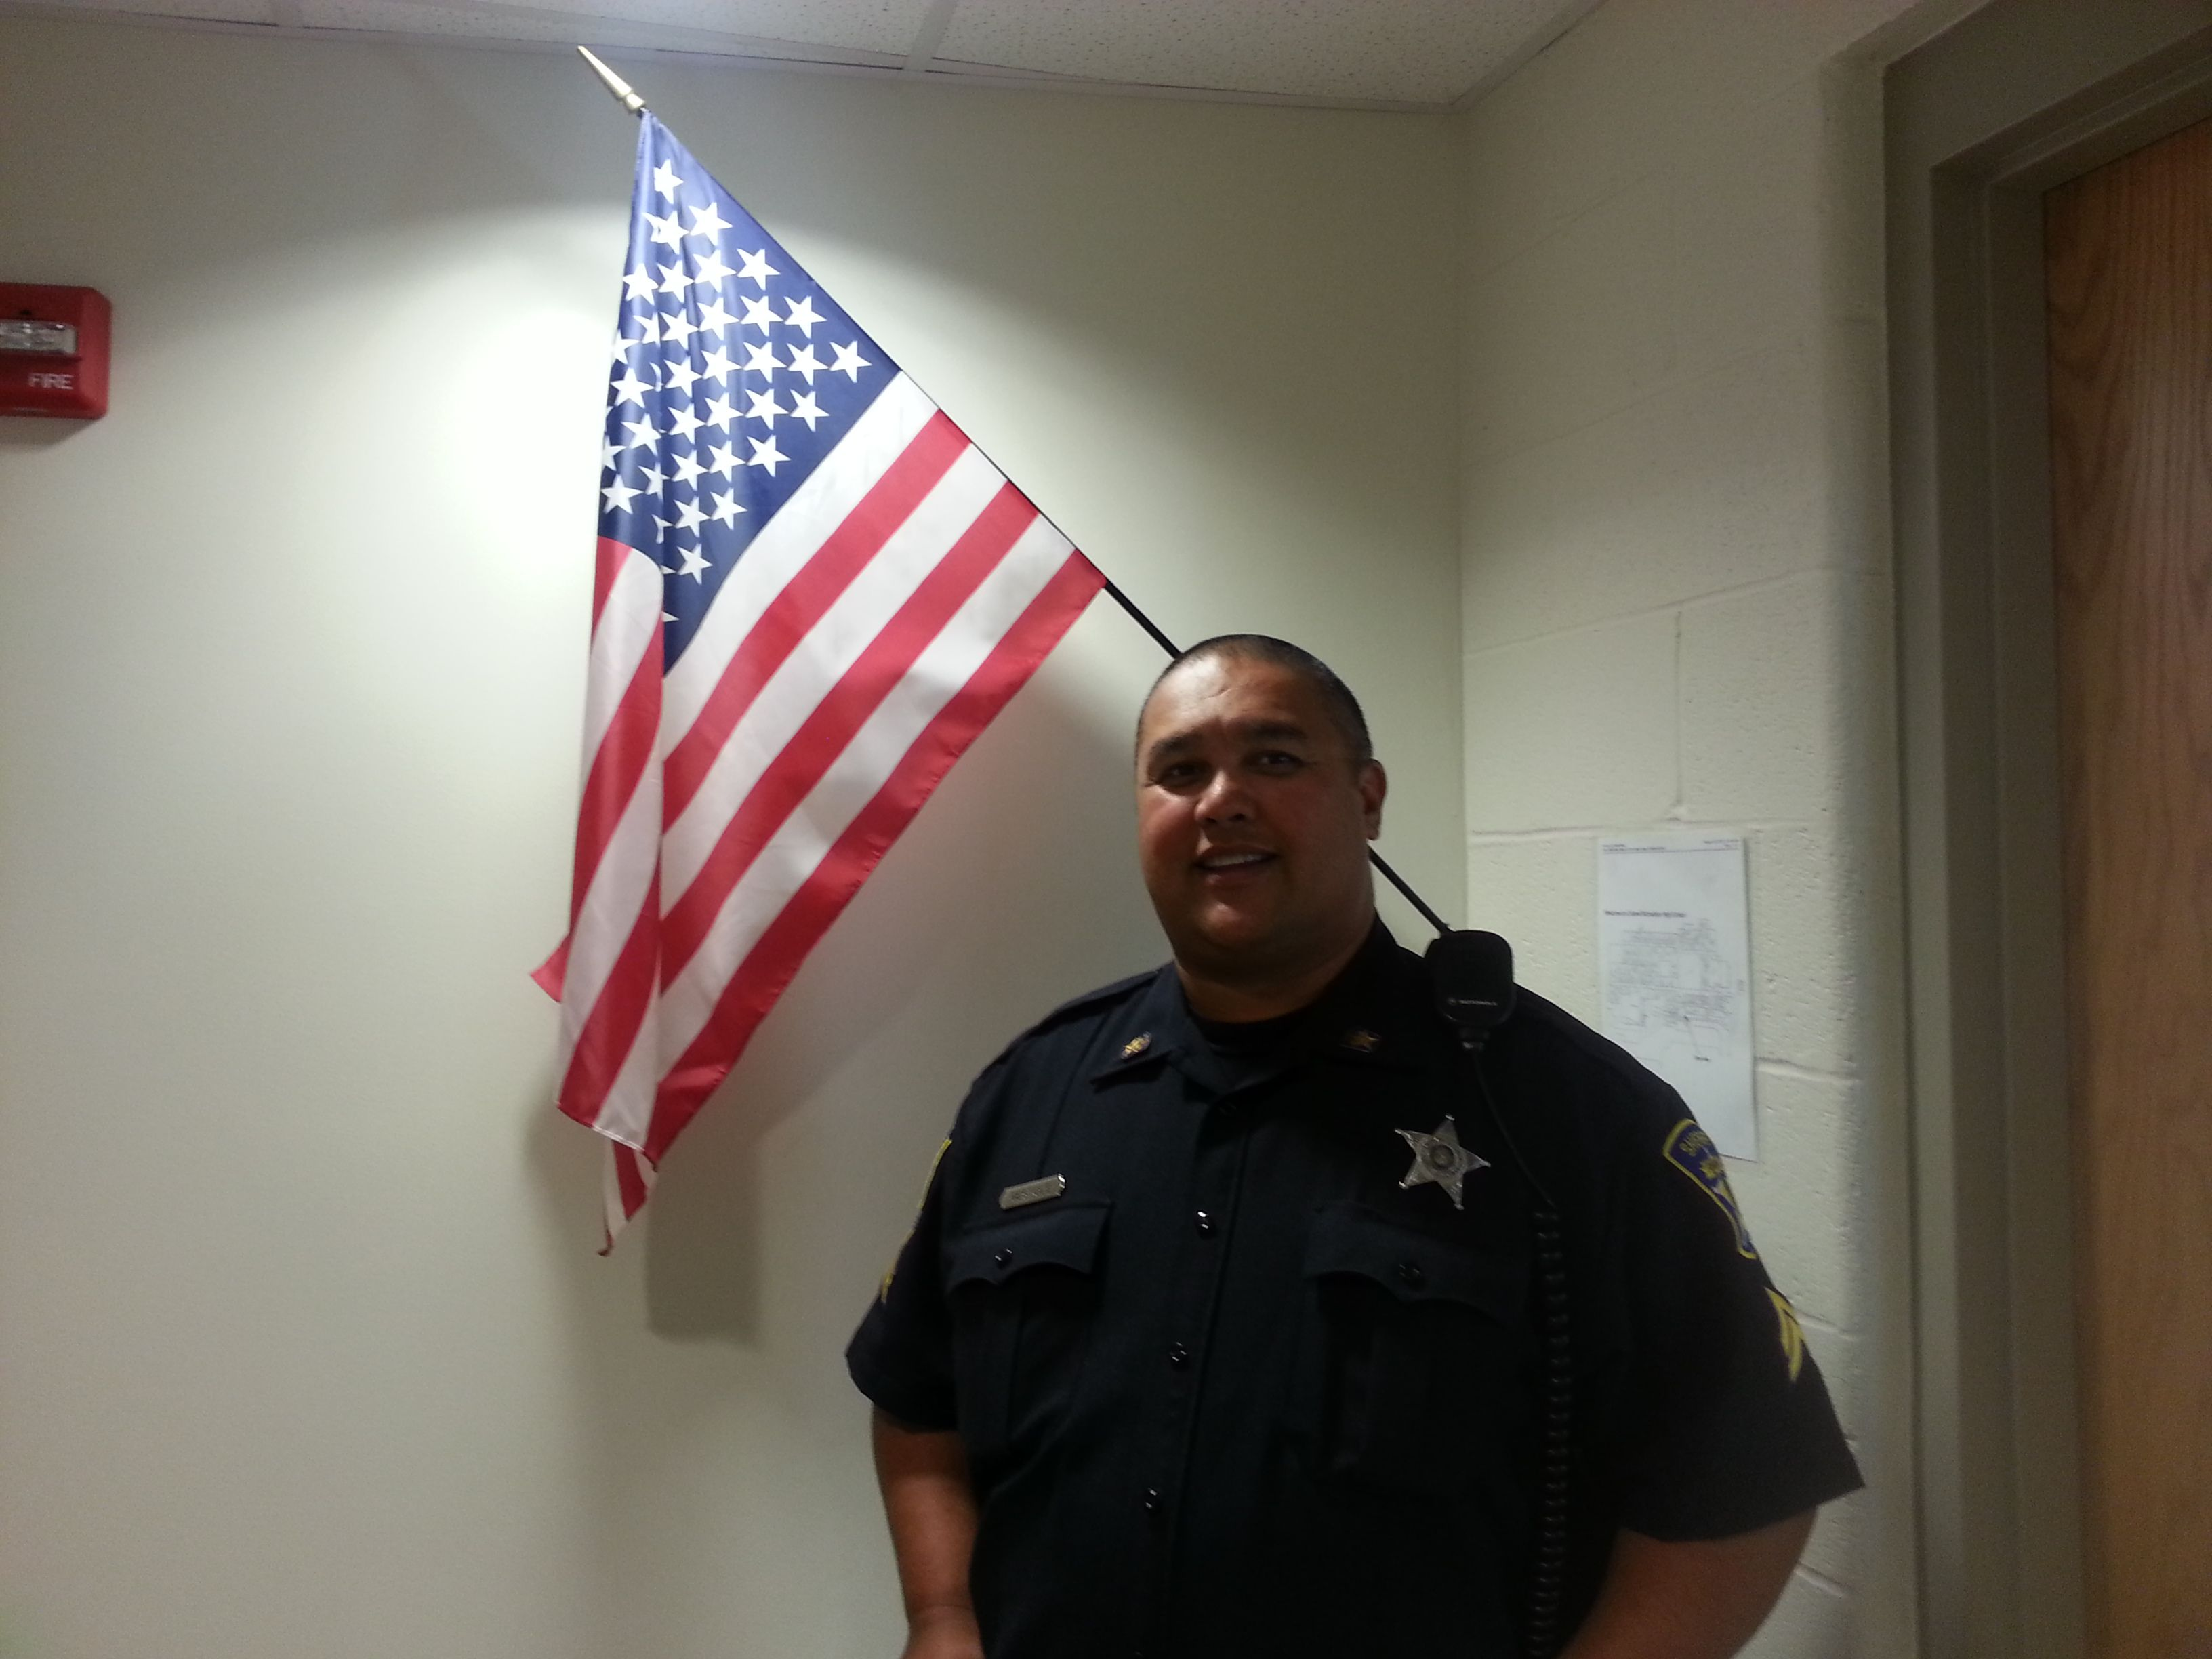 Cpl michale gestole of the caroline county sheriffs